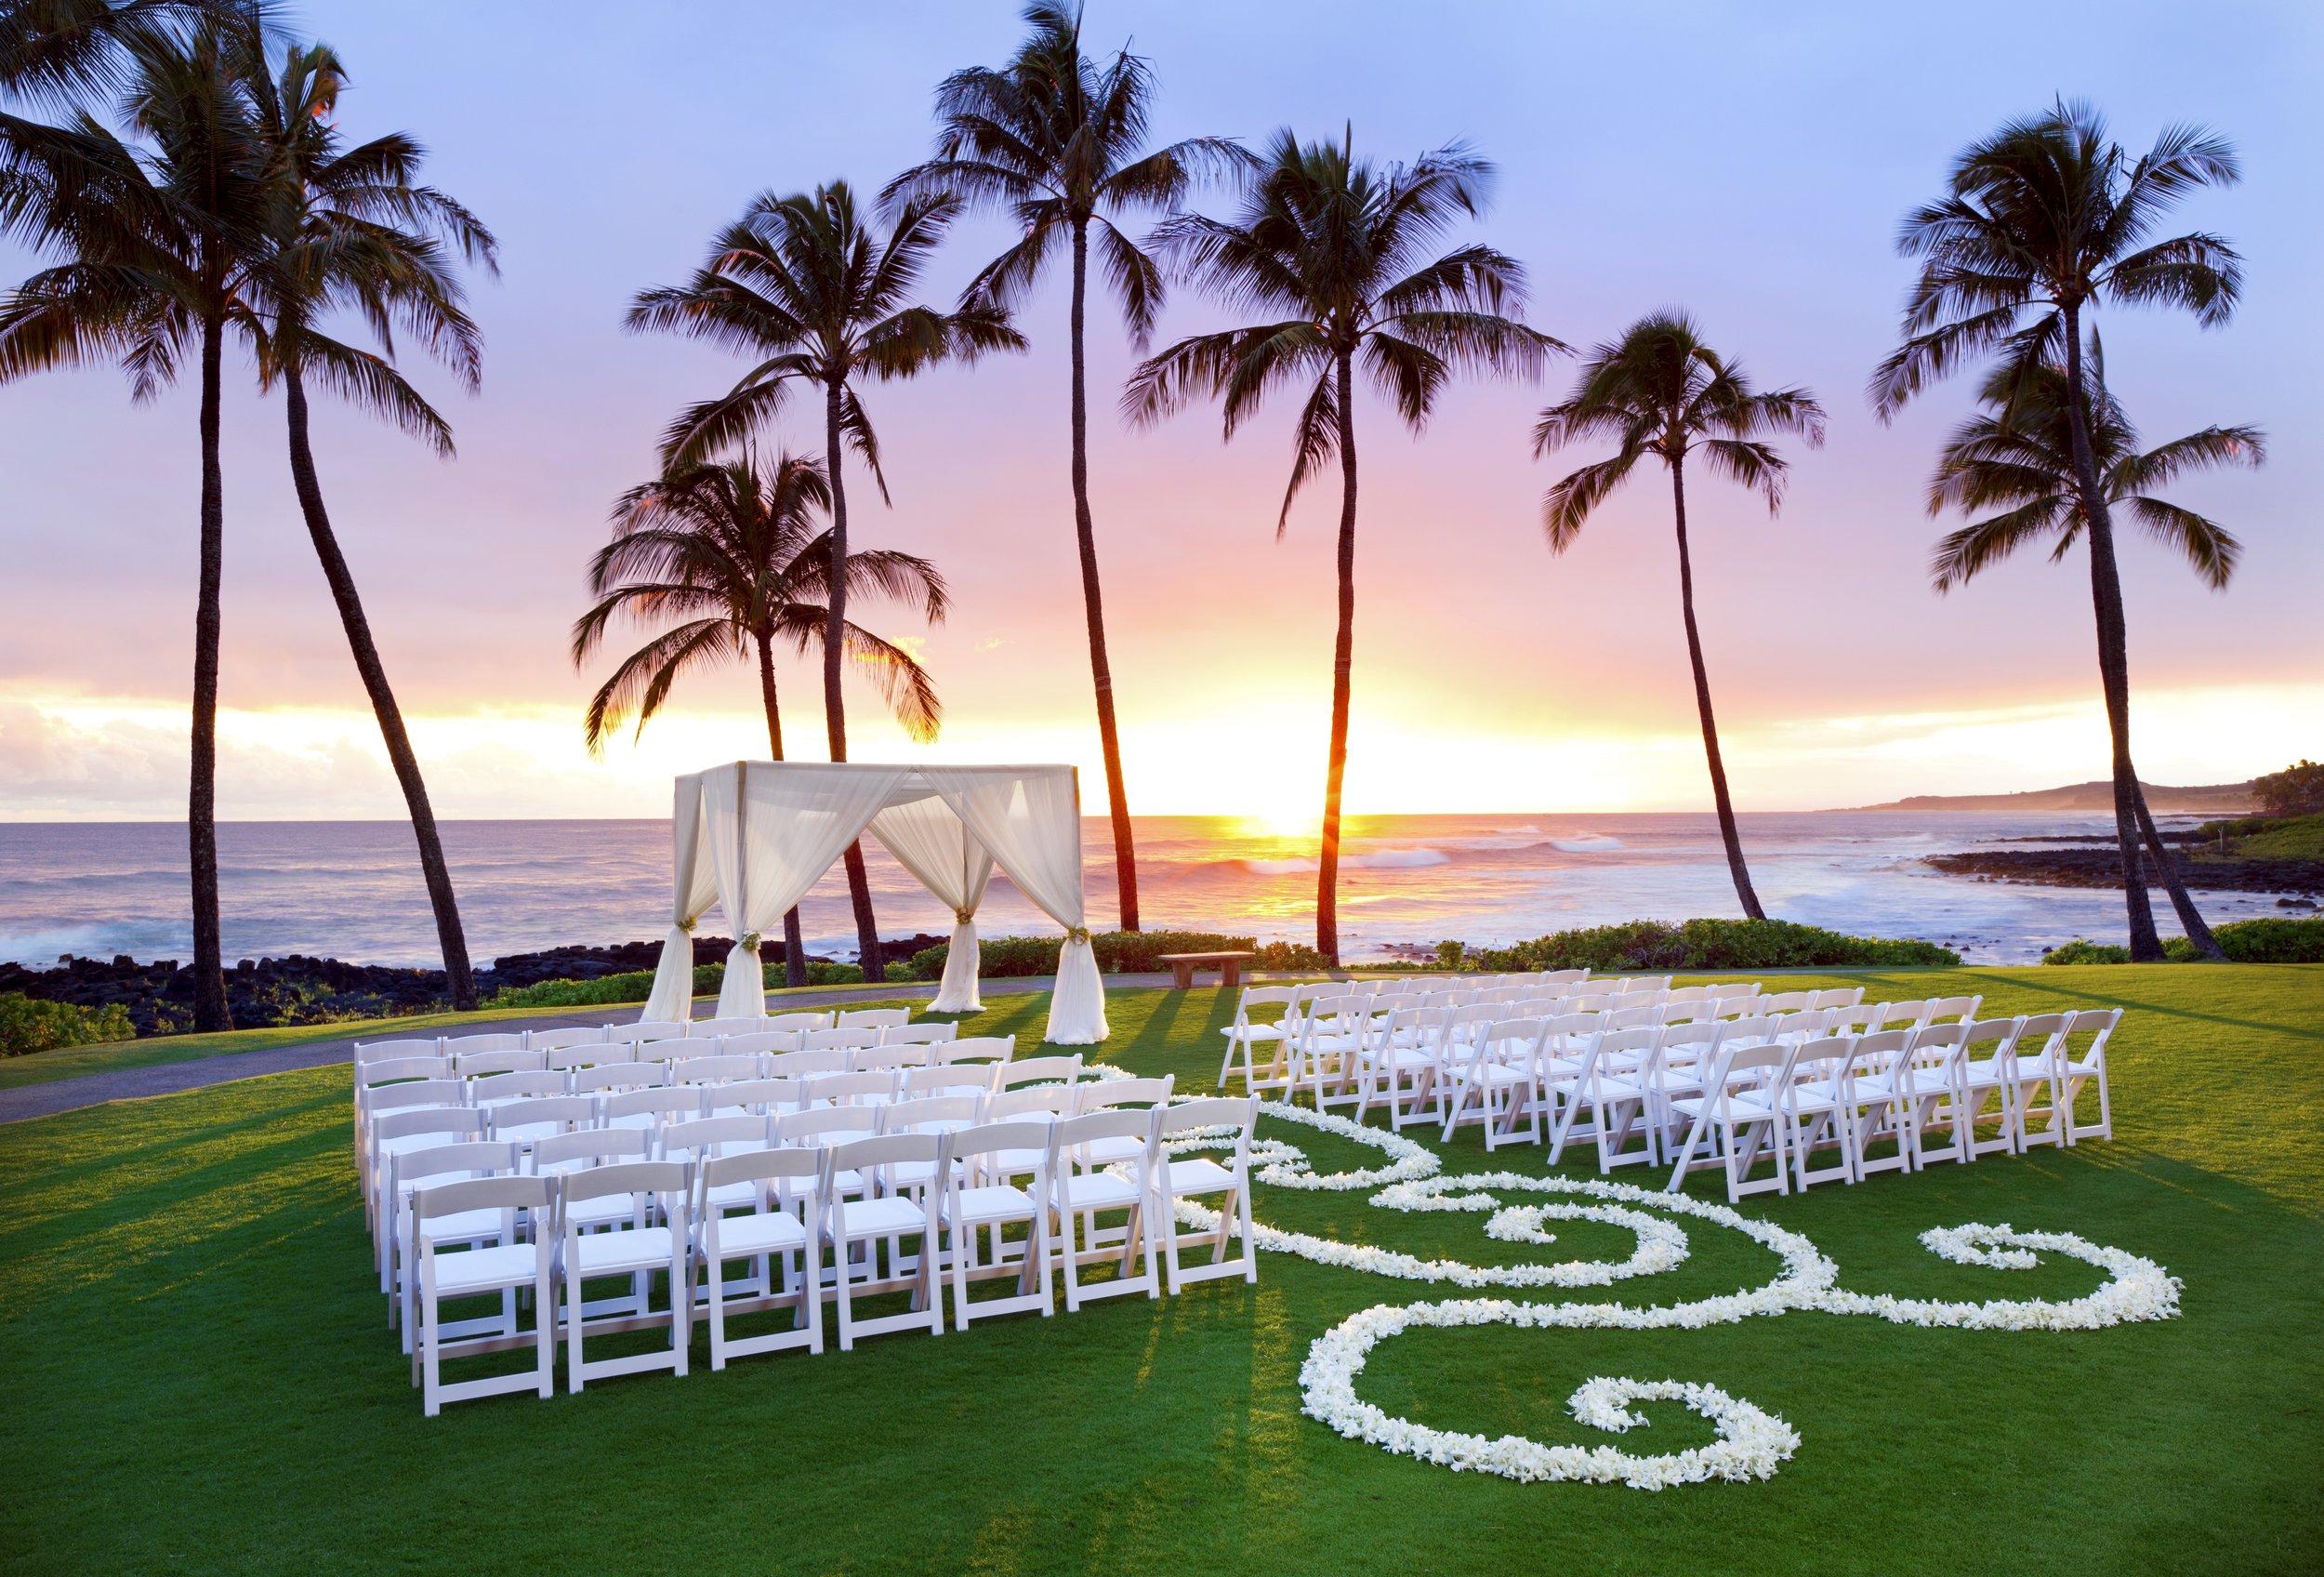 Kauai-Destination-Wedding-Sheraton-Kauai.jpg